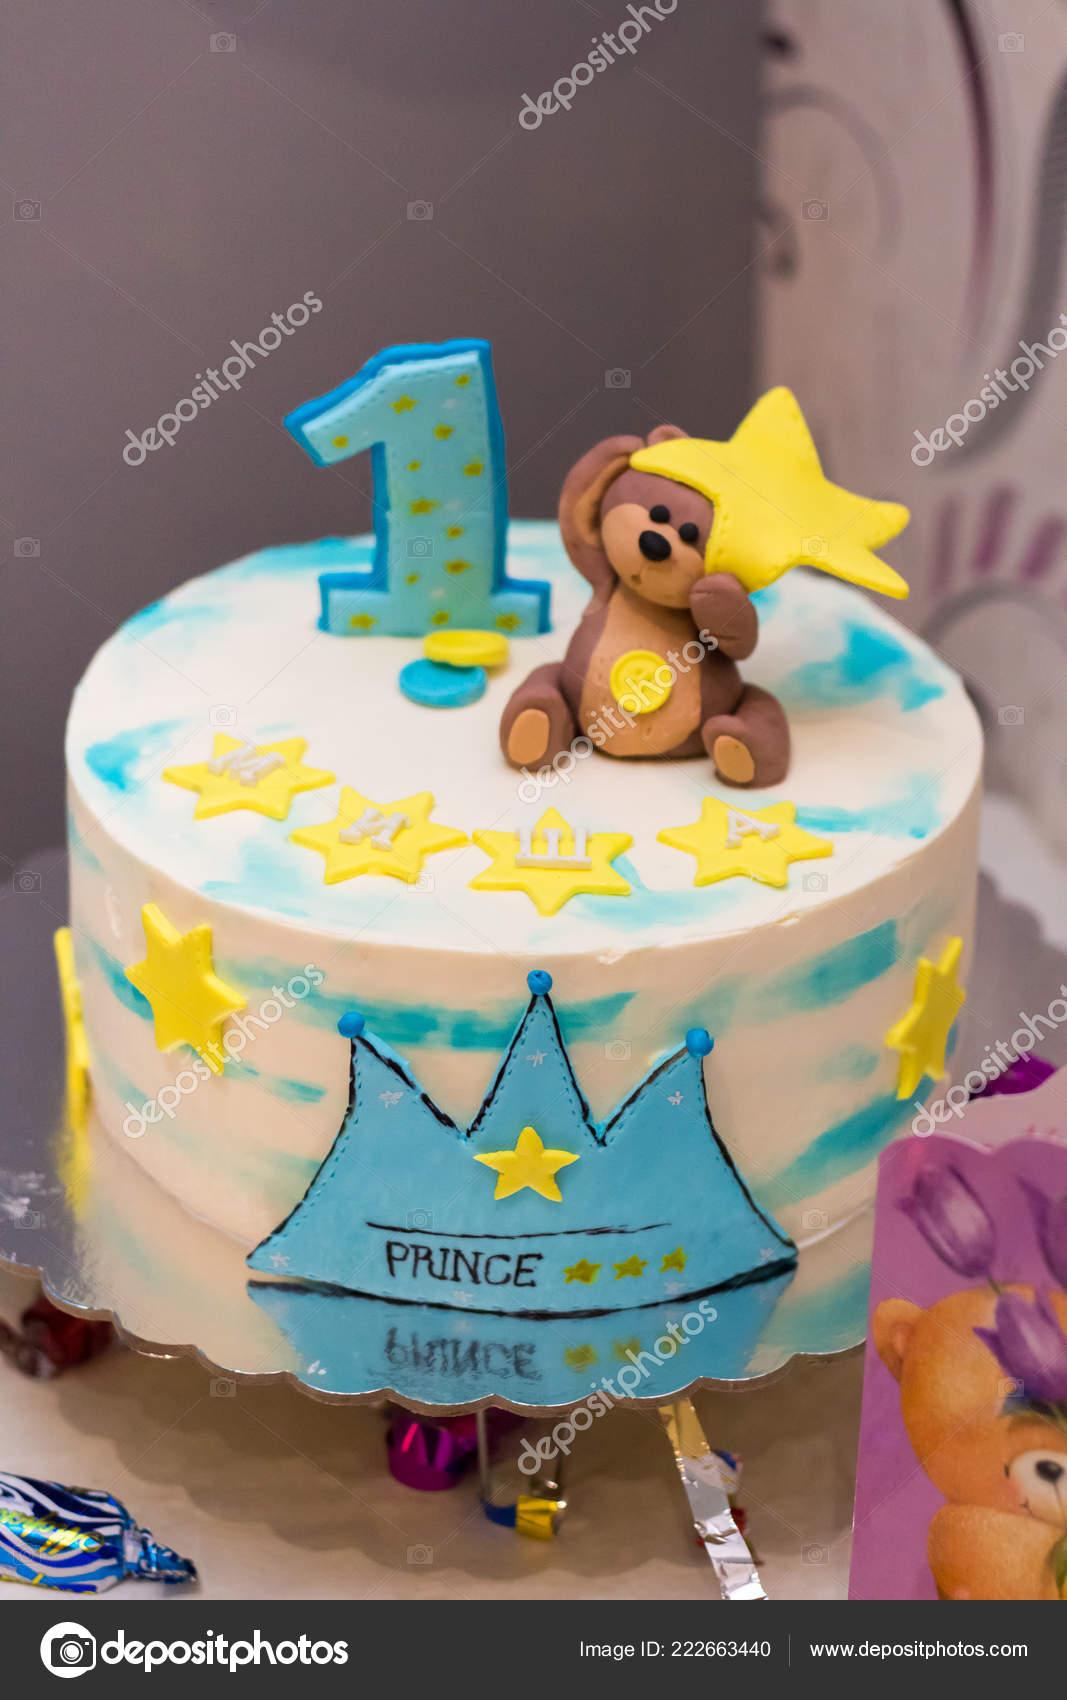 Surprising Children Birthday Cake Festive Table Stock Editorial Photo Funny Birthday Cards Online Alyptdamsfinfo